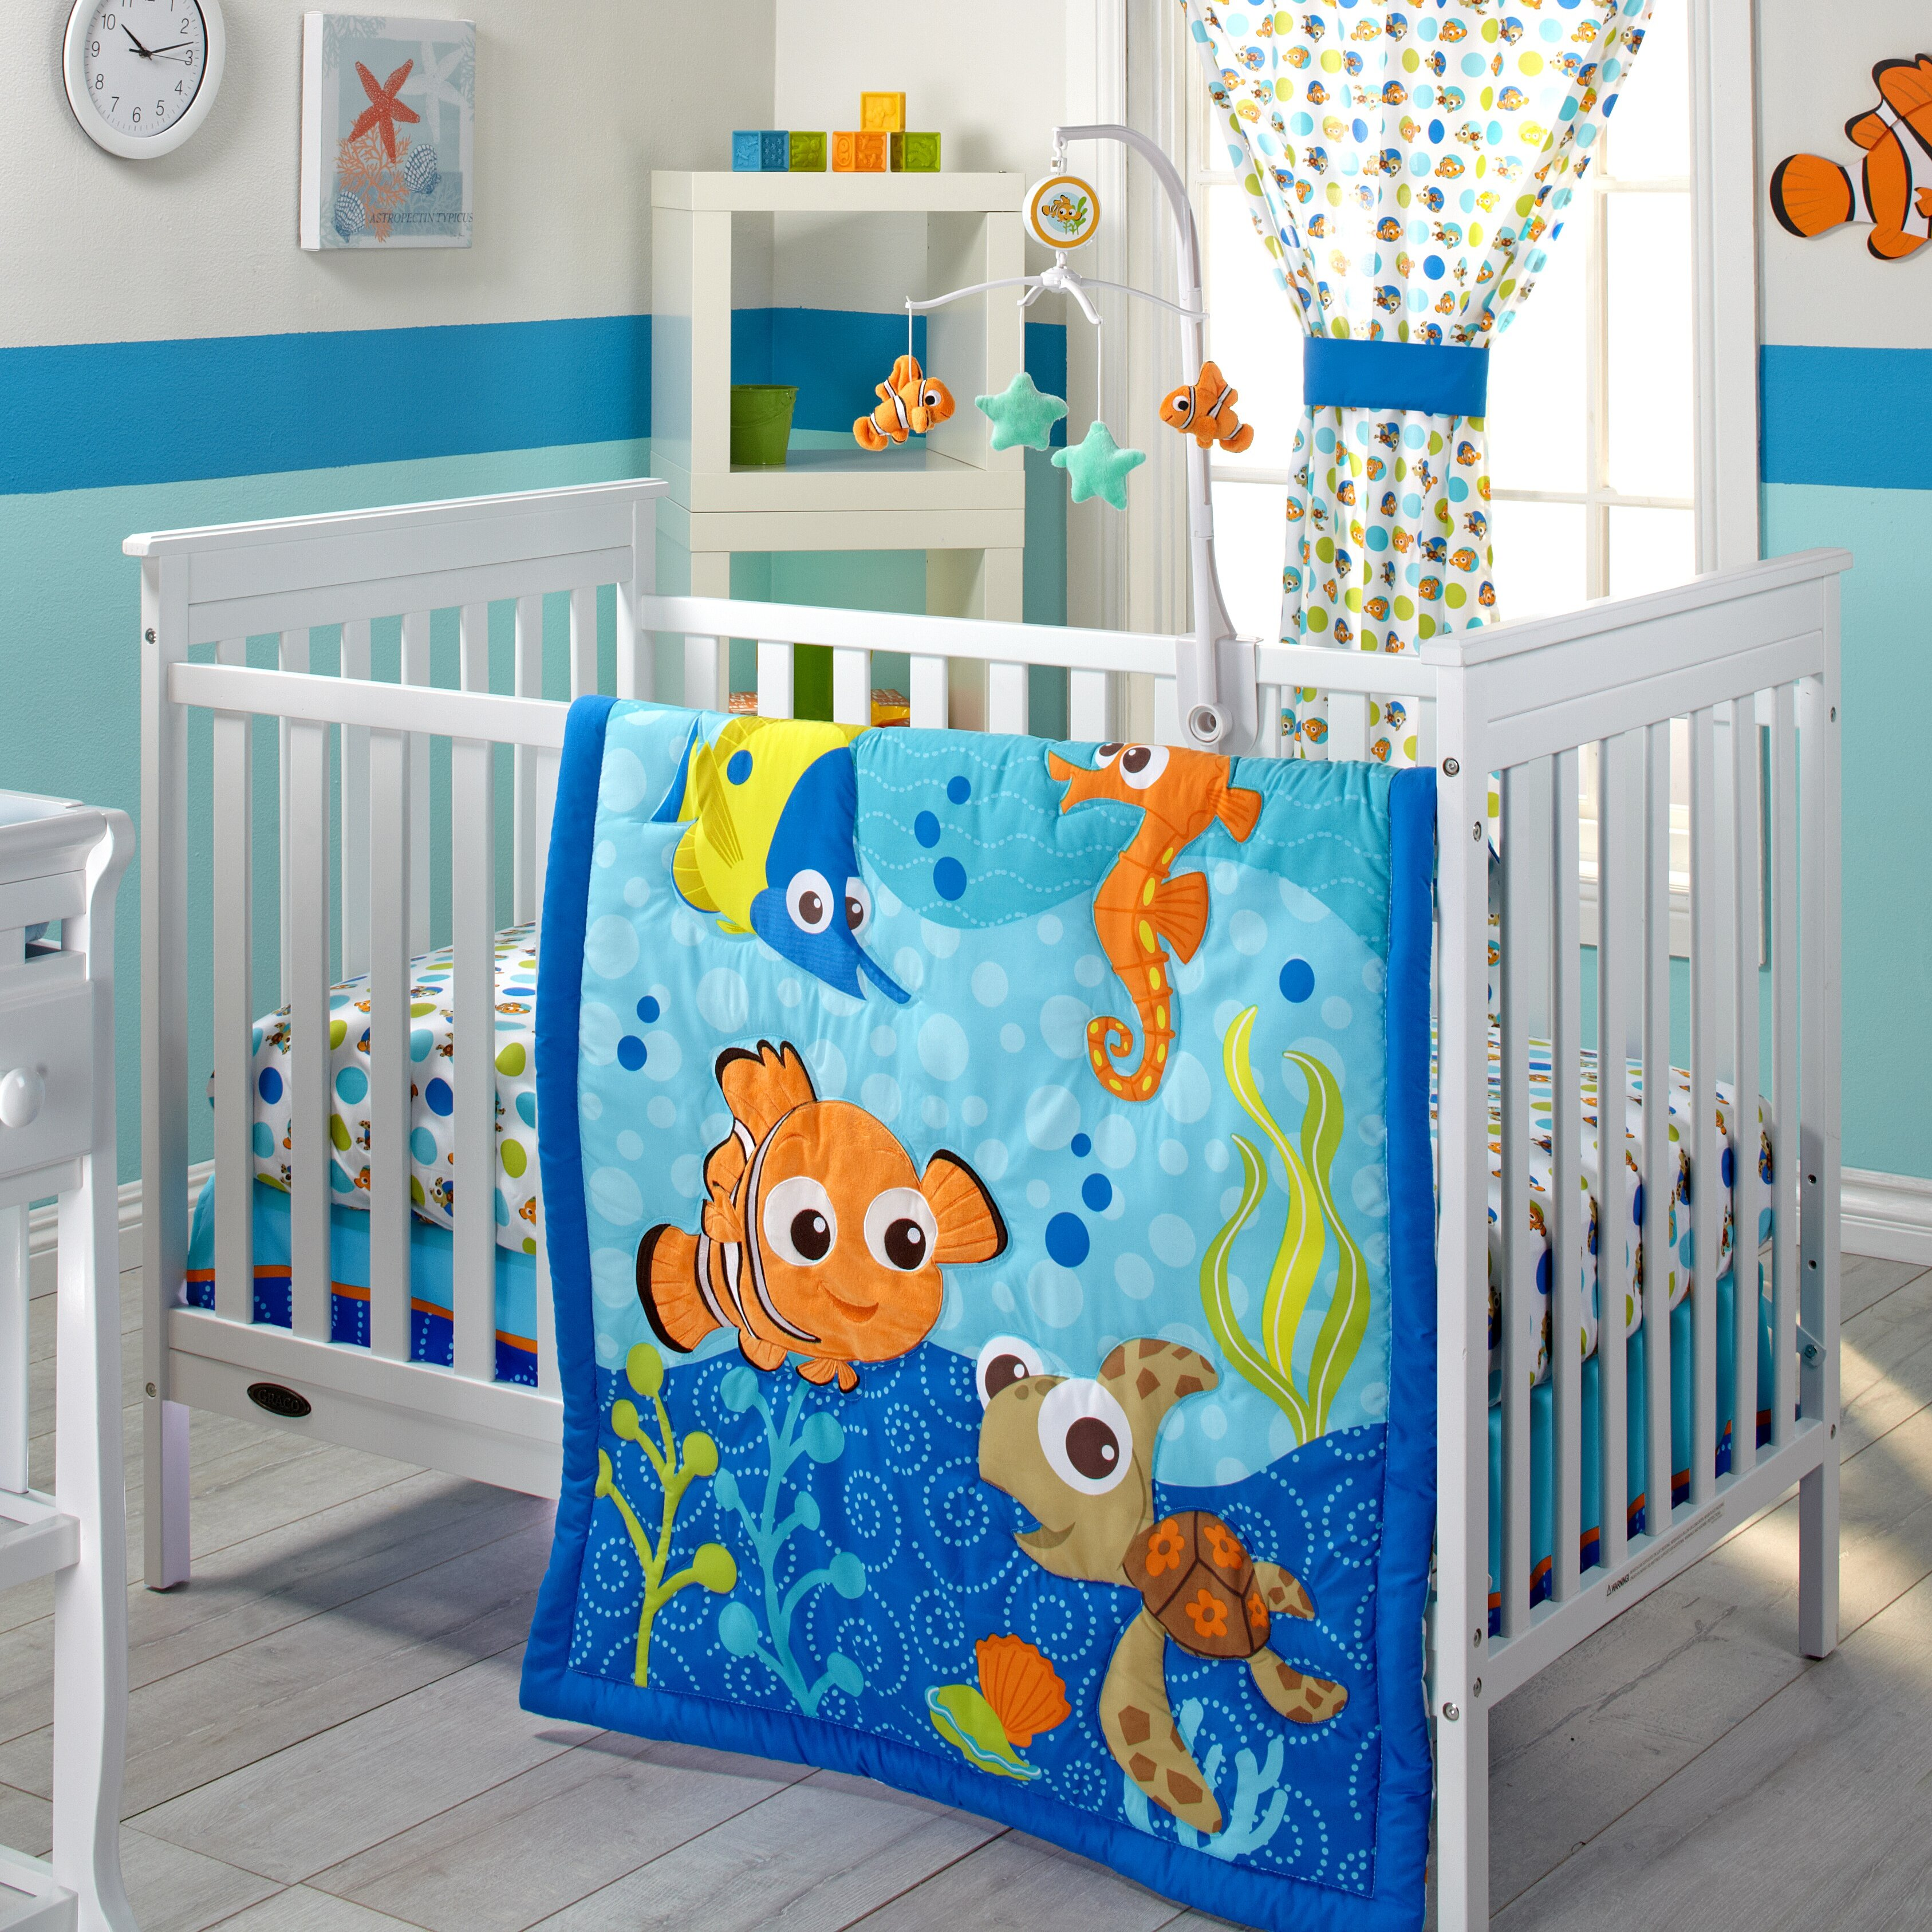 Nemo s reef 4 piece crib bedding set disney baby - Bedding Disney Pixar Finding Nemo Piece Crib Bedding Set Babies R Us